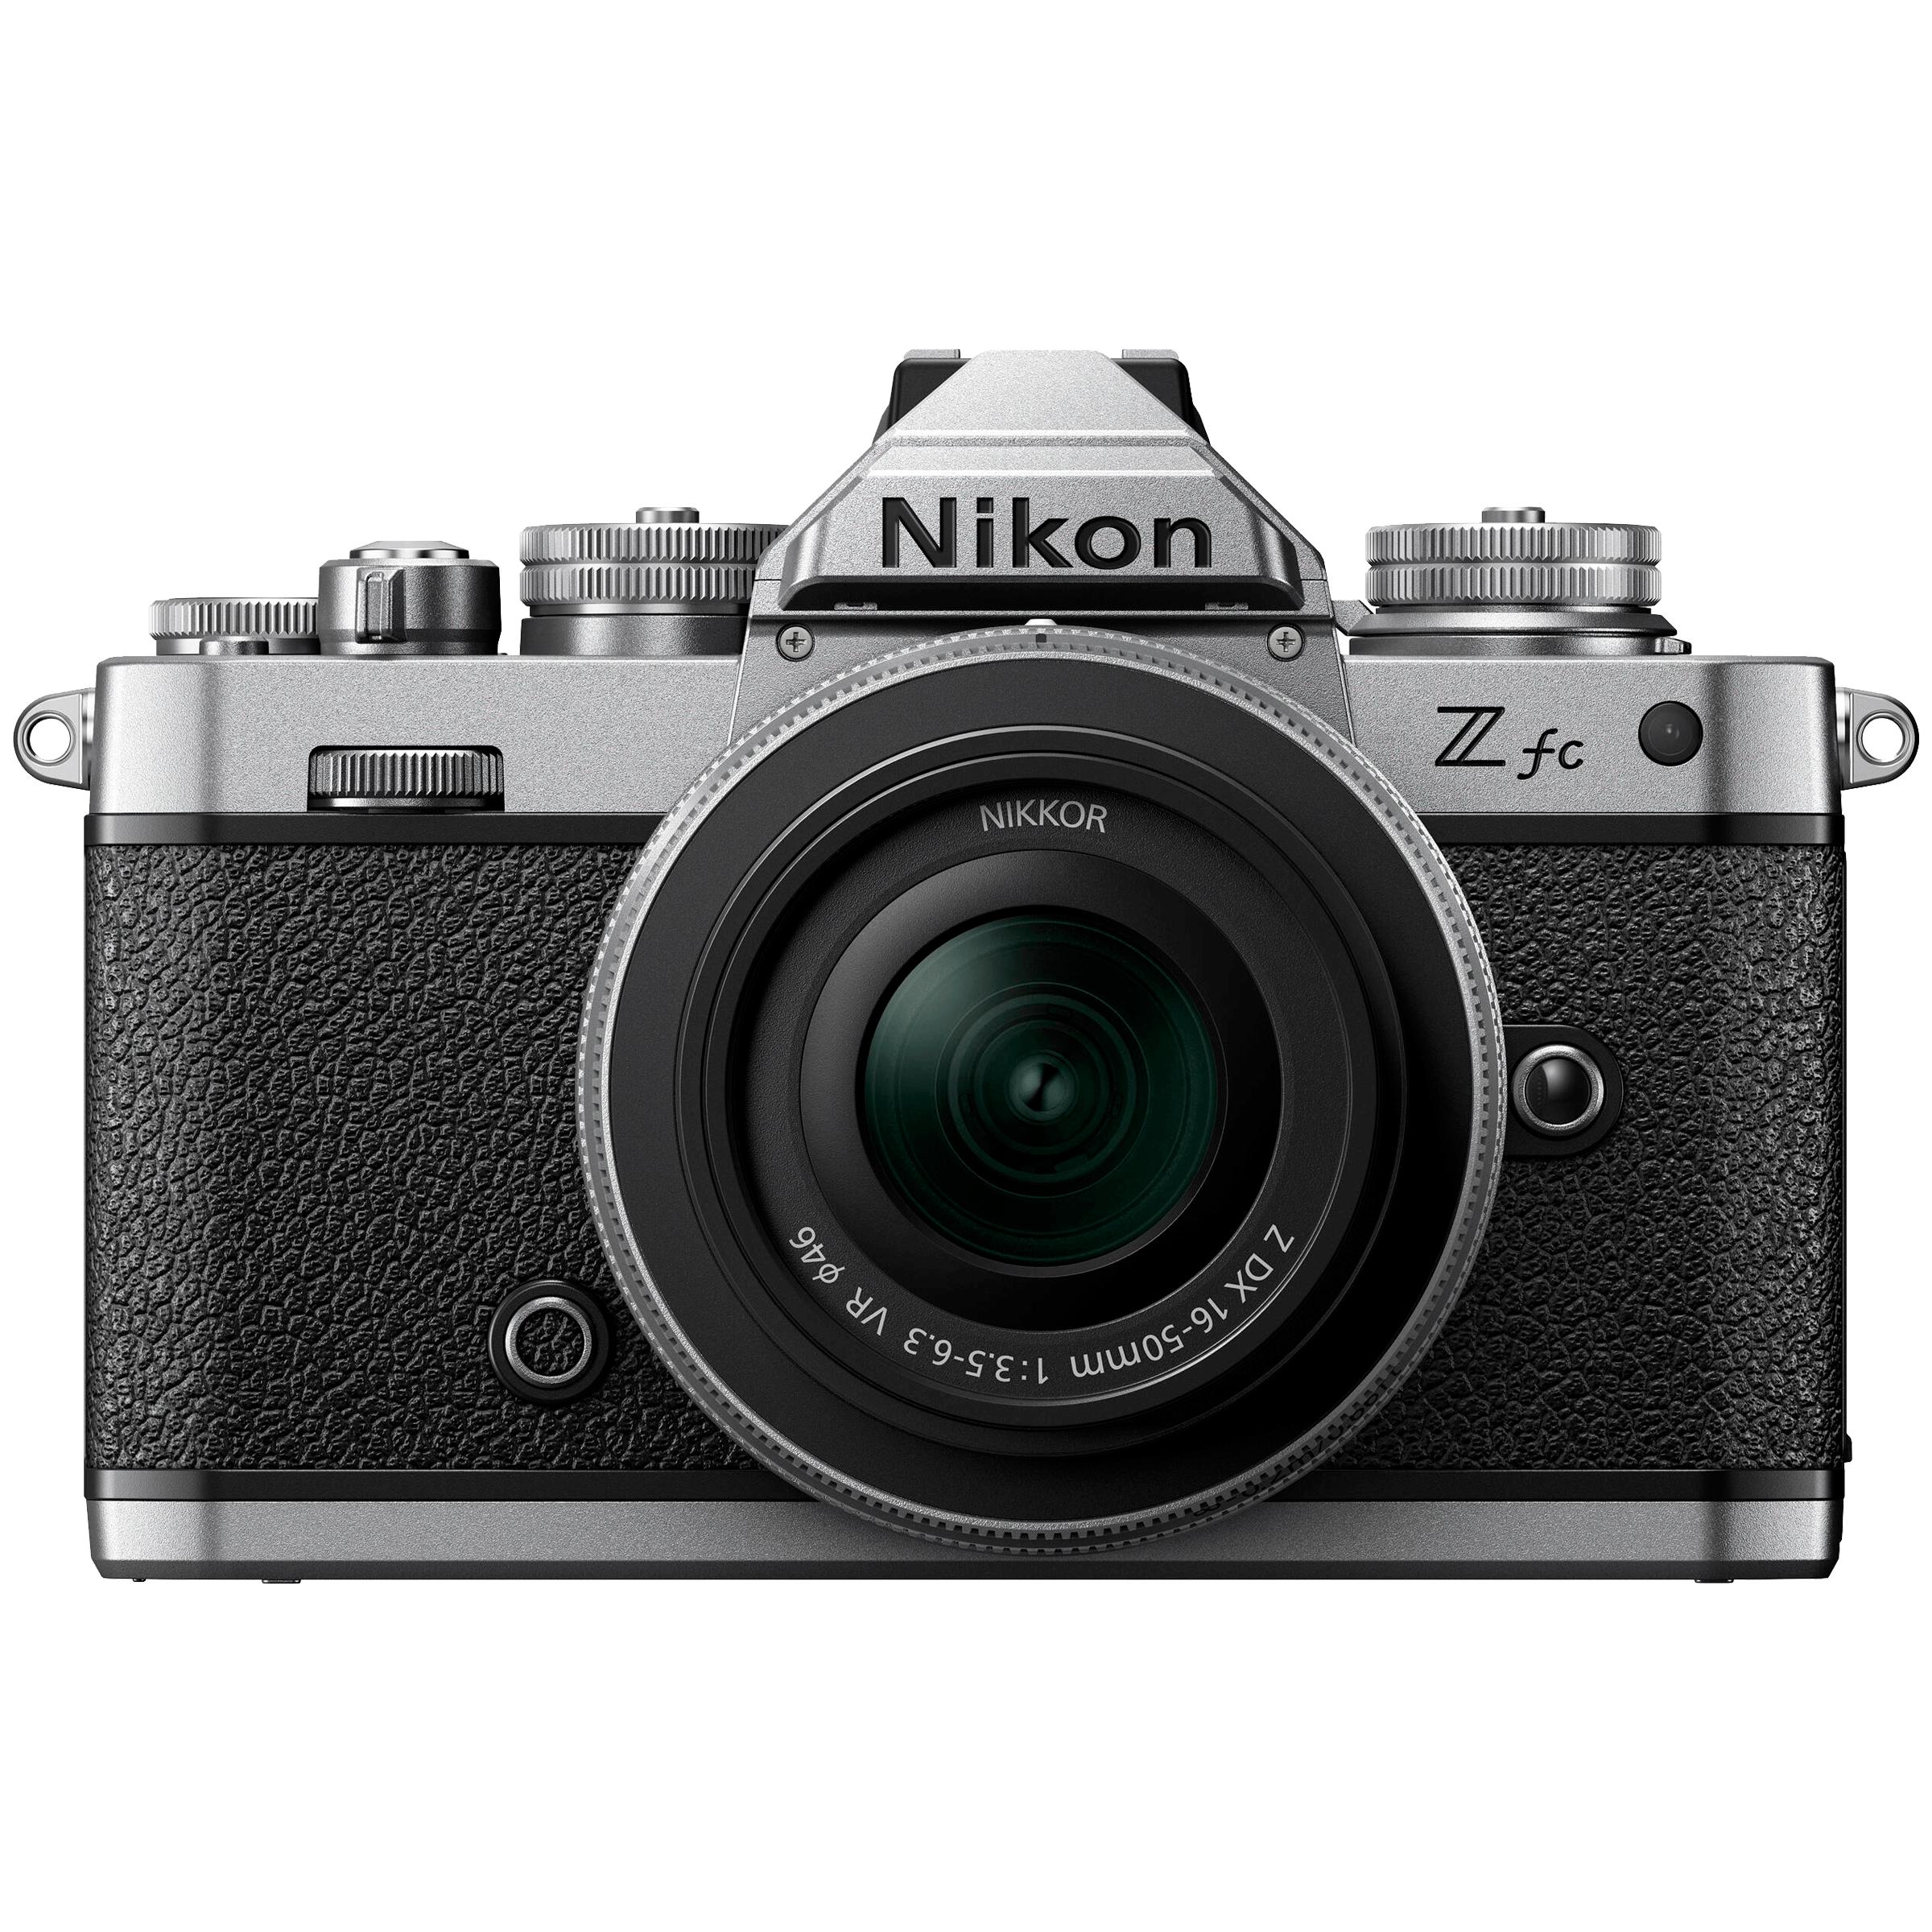 Nikon Z FC 20.9MP Mirrorless Camera (16-50mm Lens, Flash-Ready Indicator, VOK090XN, Black)_1